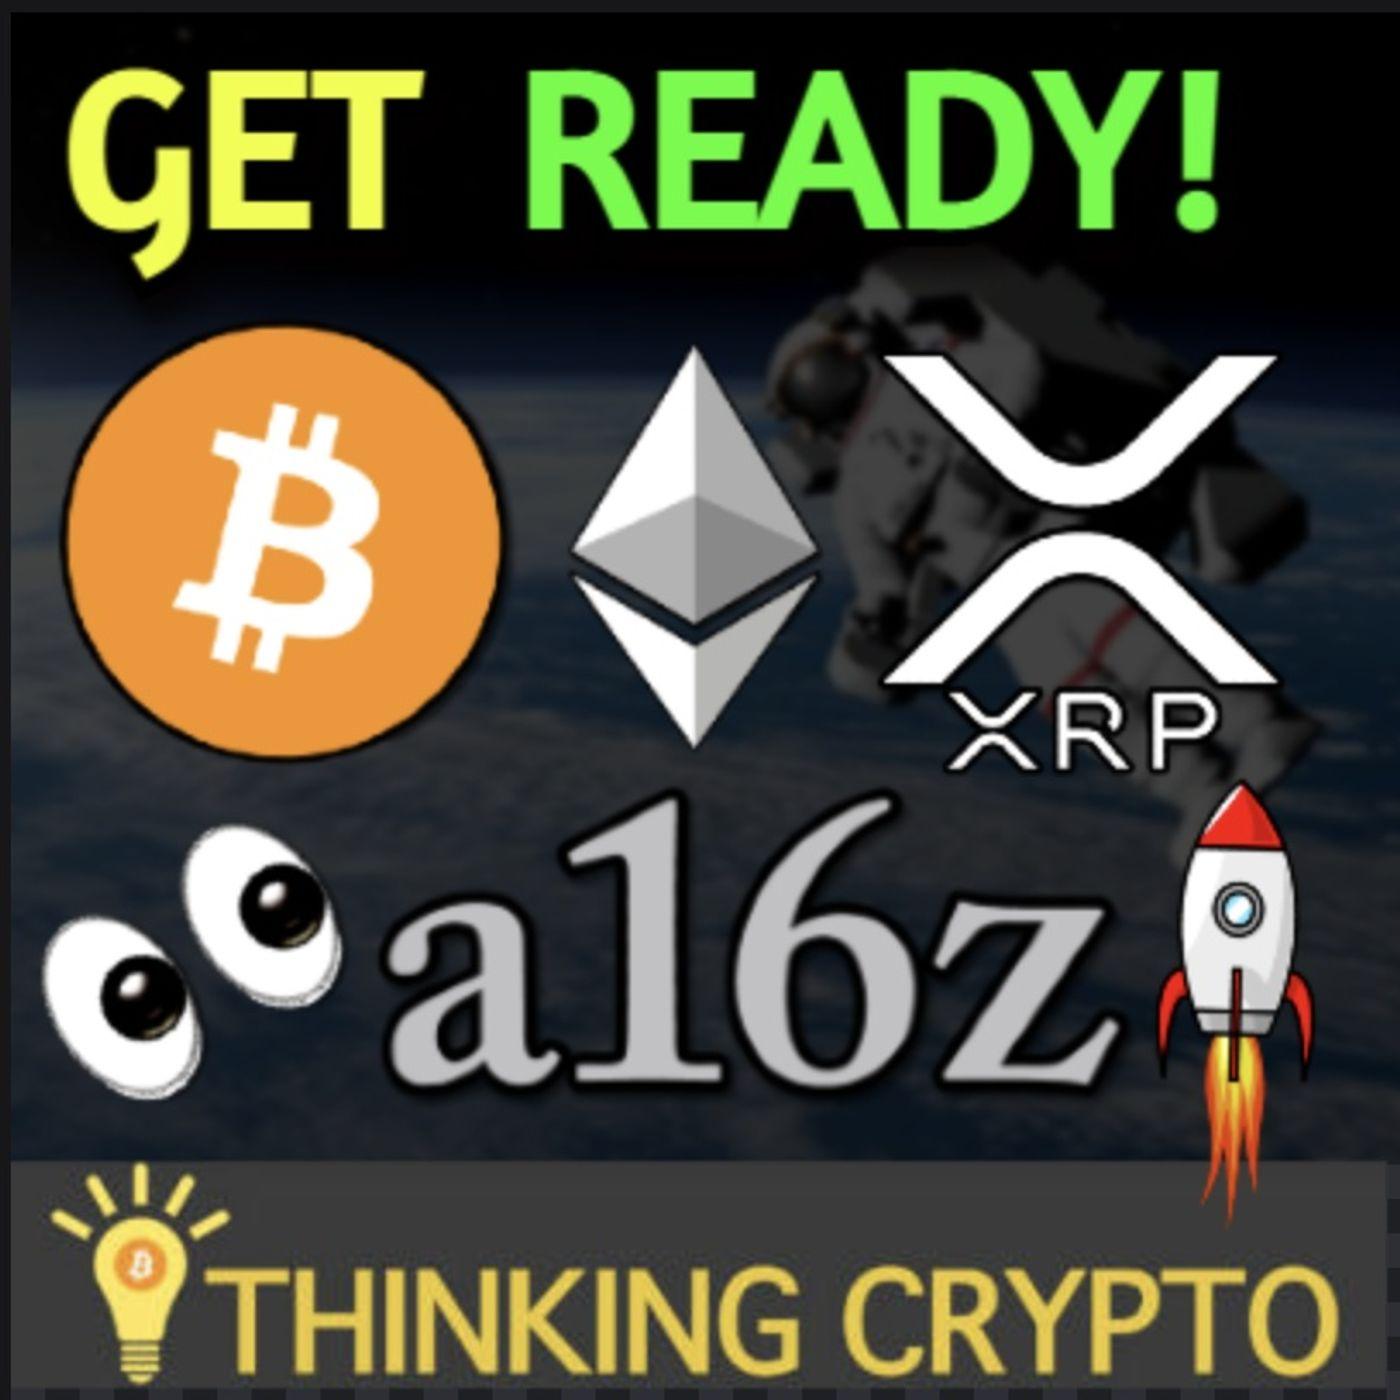 Bitcoin Breakout, Ethereum $10K, XRP $2 - a16z $1 Billion Crypto Fund & Ripple SEC Hearing